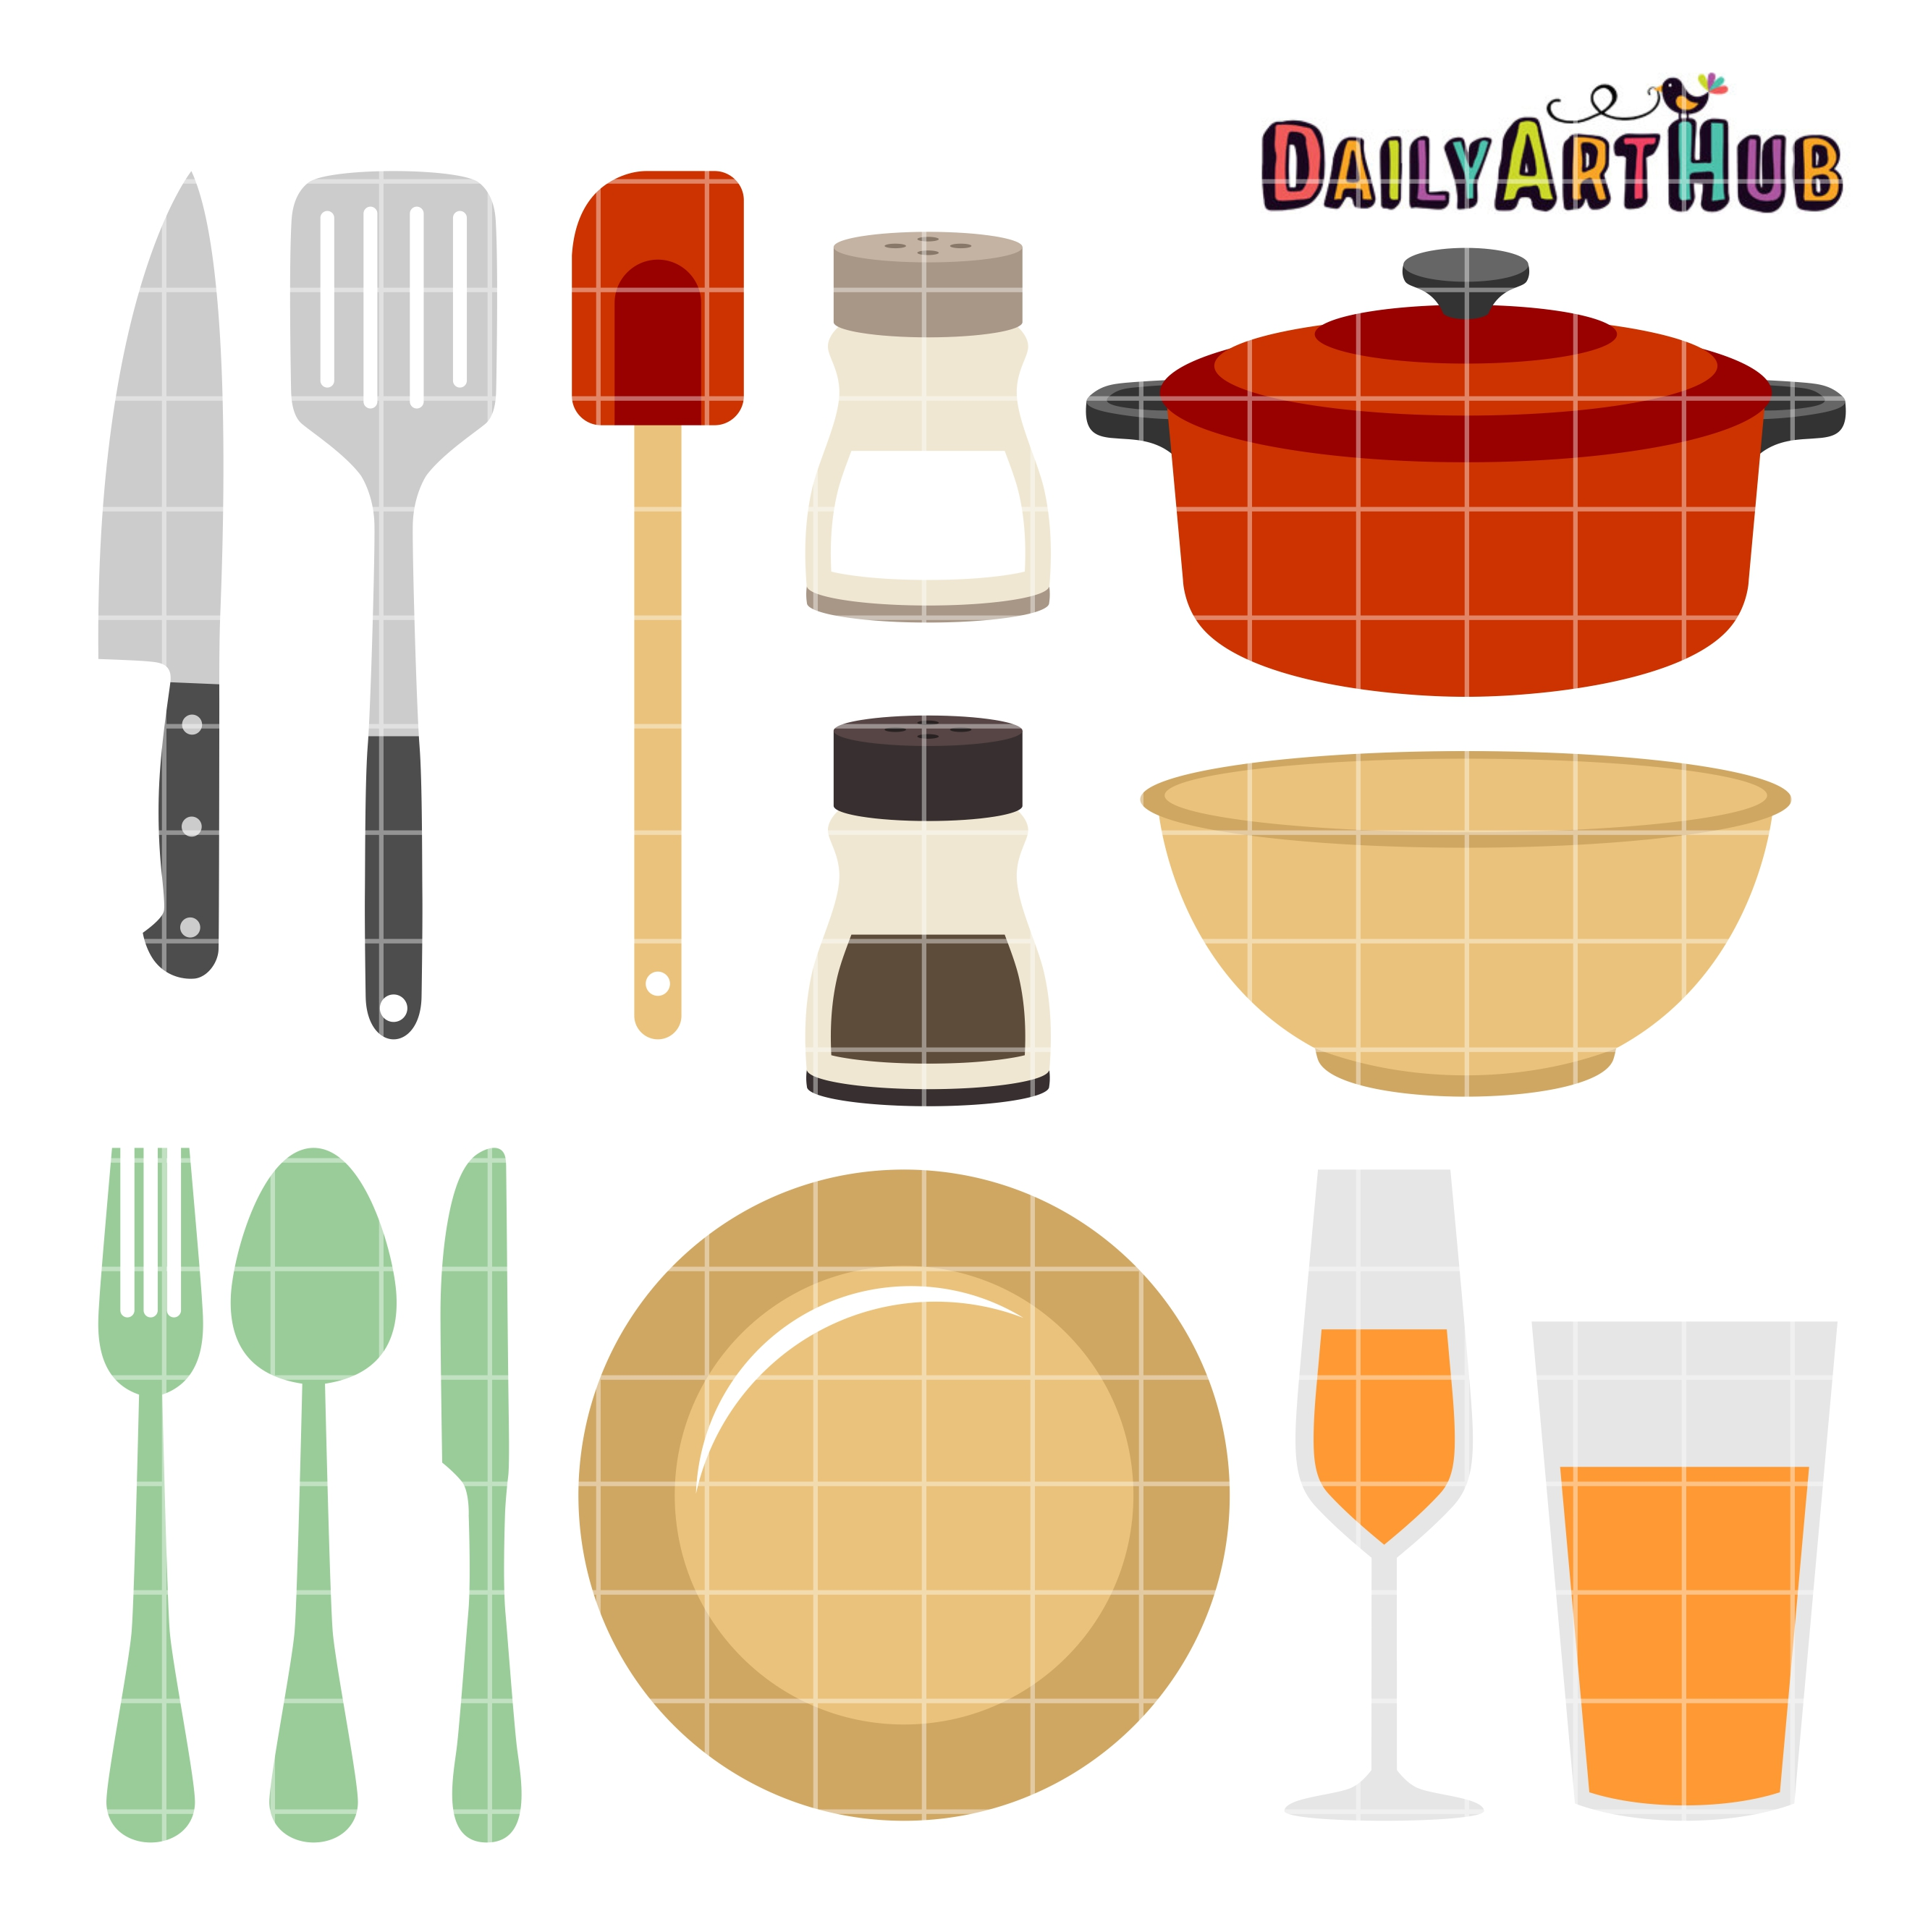 2664x2670 Kitchen Things Clip Art Set Daily Art Hub Free Clip Art Everyday